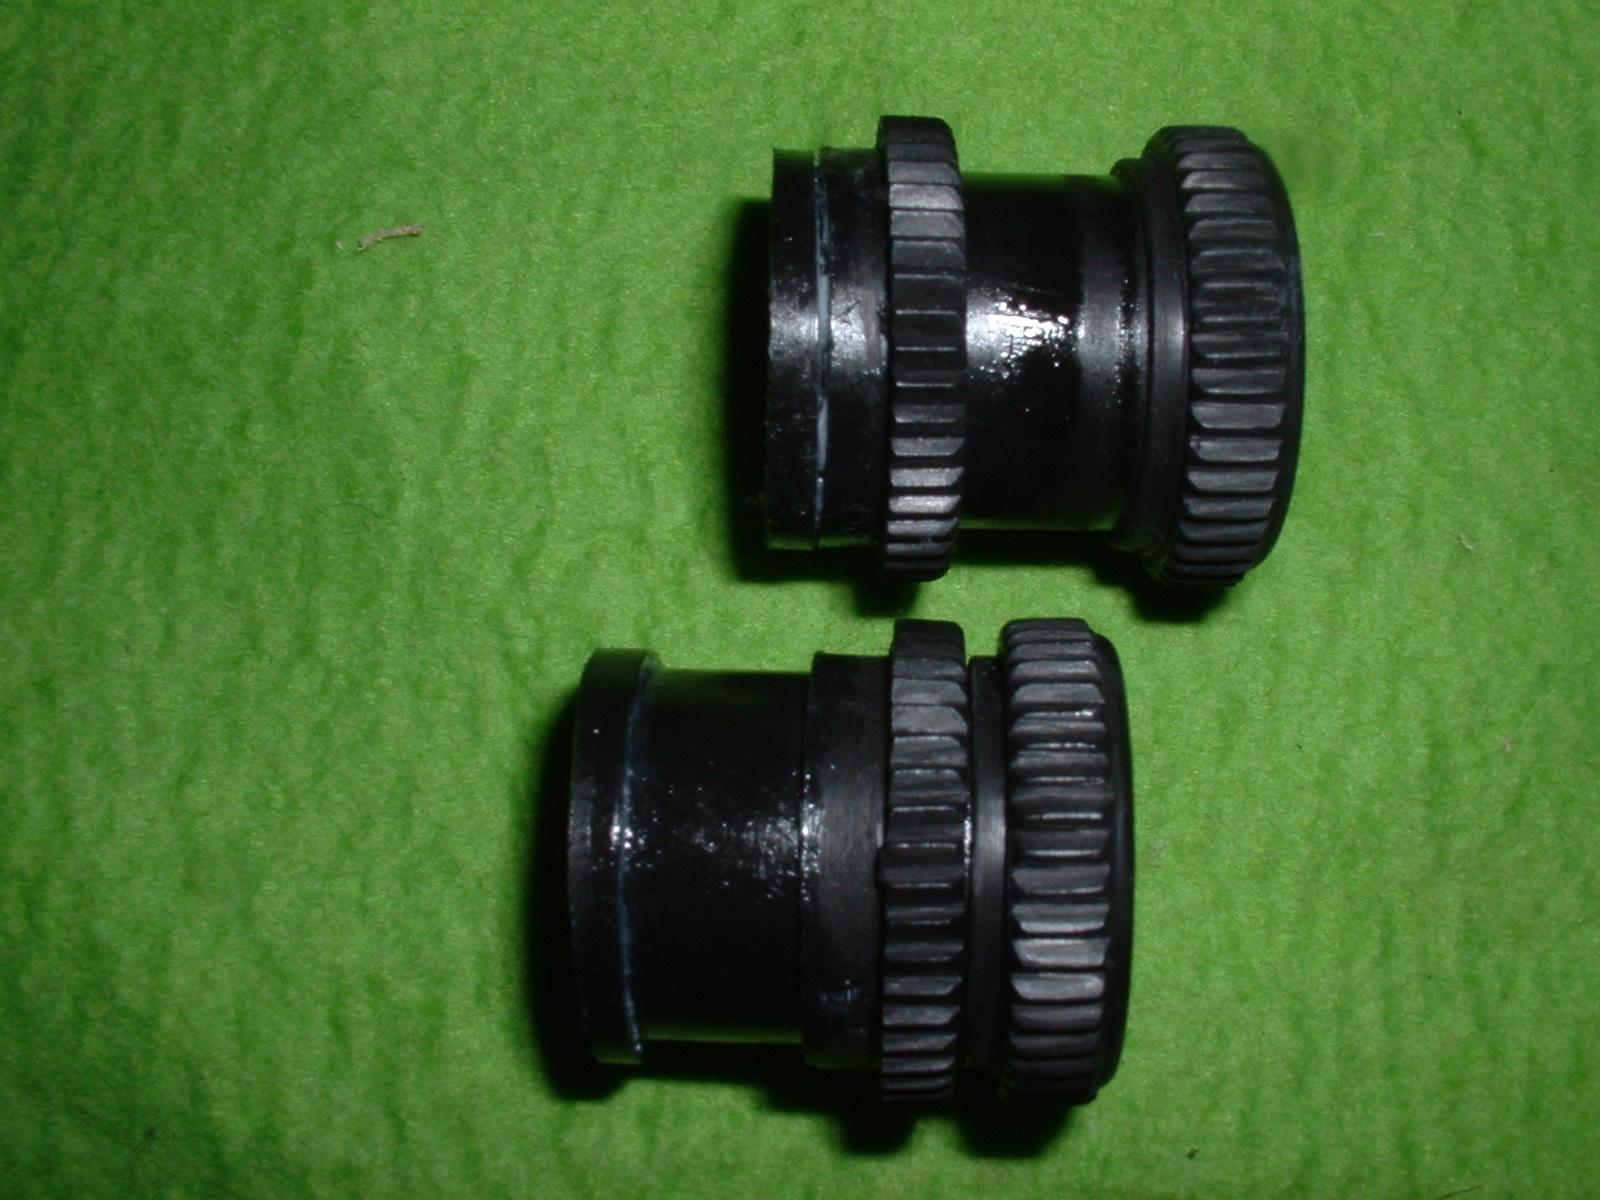 LS(現マイクロエース「M16用スコープ」小改造2 Doburoku-TAO.JPG